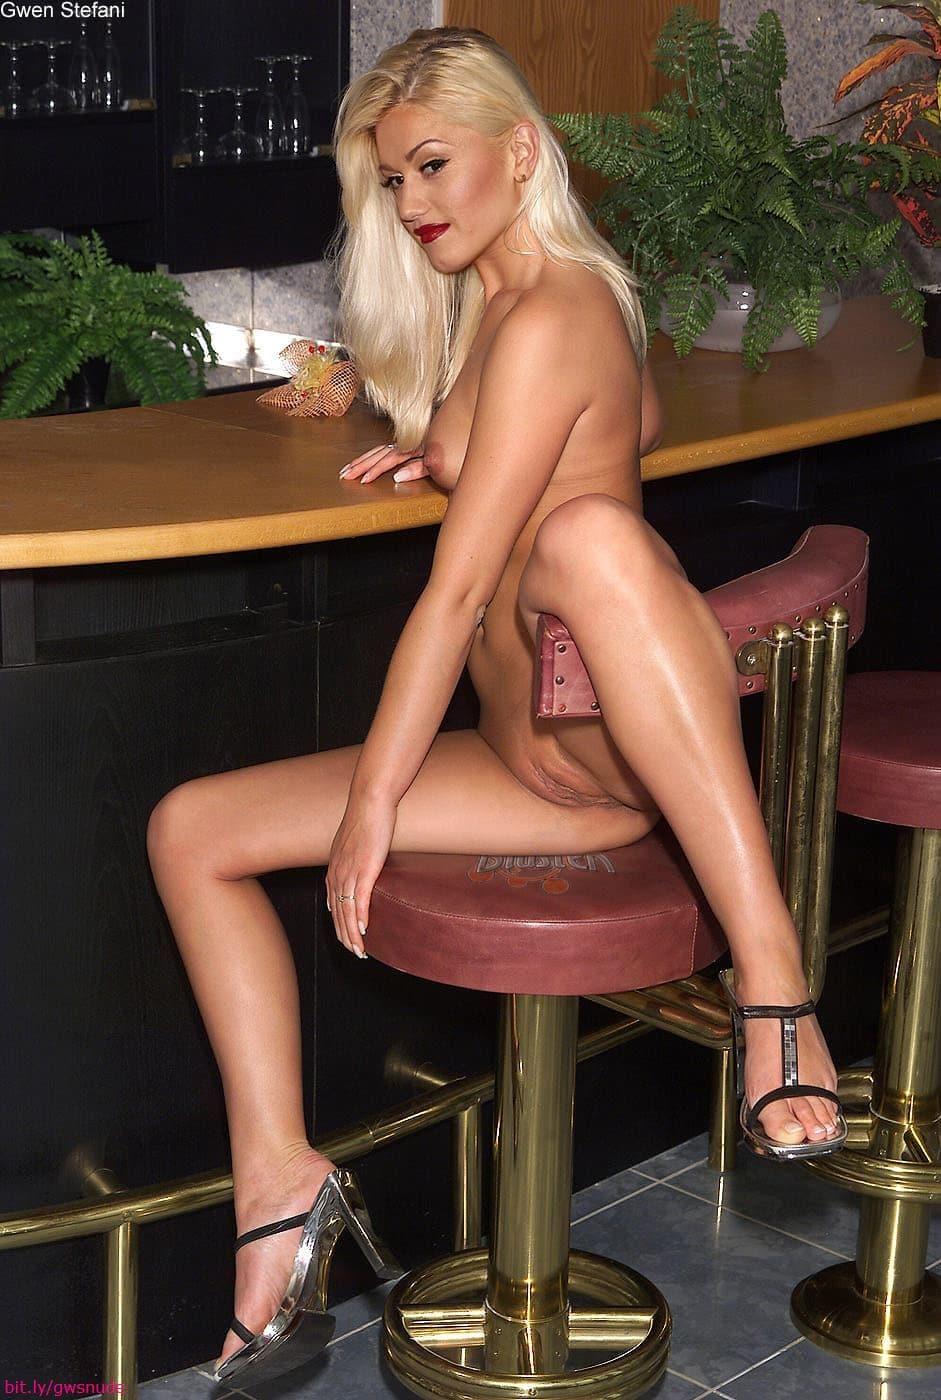 gwen stefanie nude pic